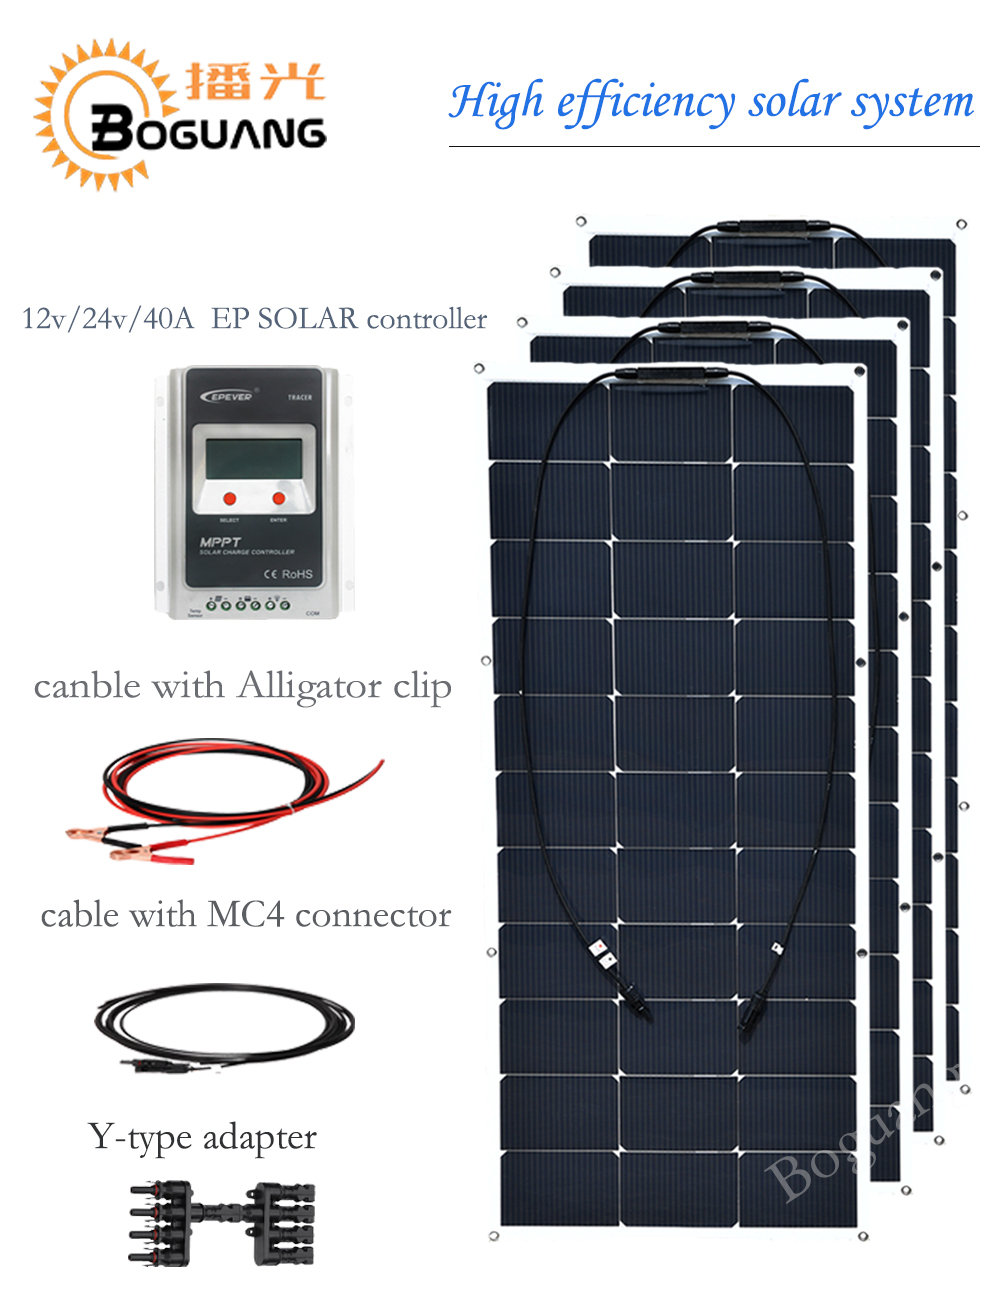 Boguang 100w flexible solar panel 400w solar system 40A EPSOLAR controller DIY kit module cell for RV car LED light 12v battery 100w 12v solar panel module 20a cmg controller 1000w off grid for car traile solar generators